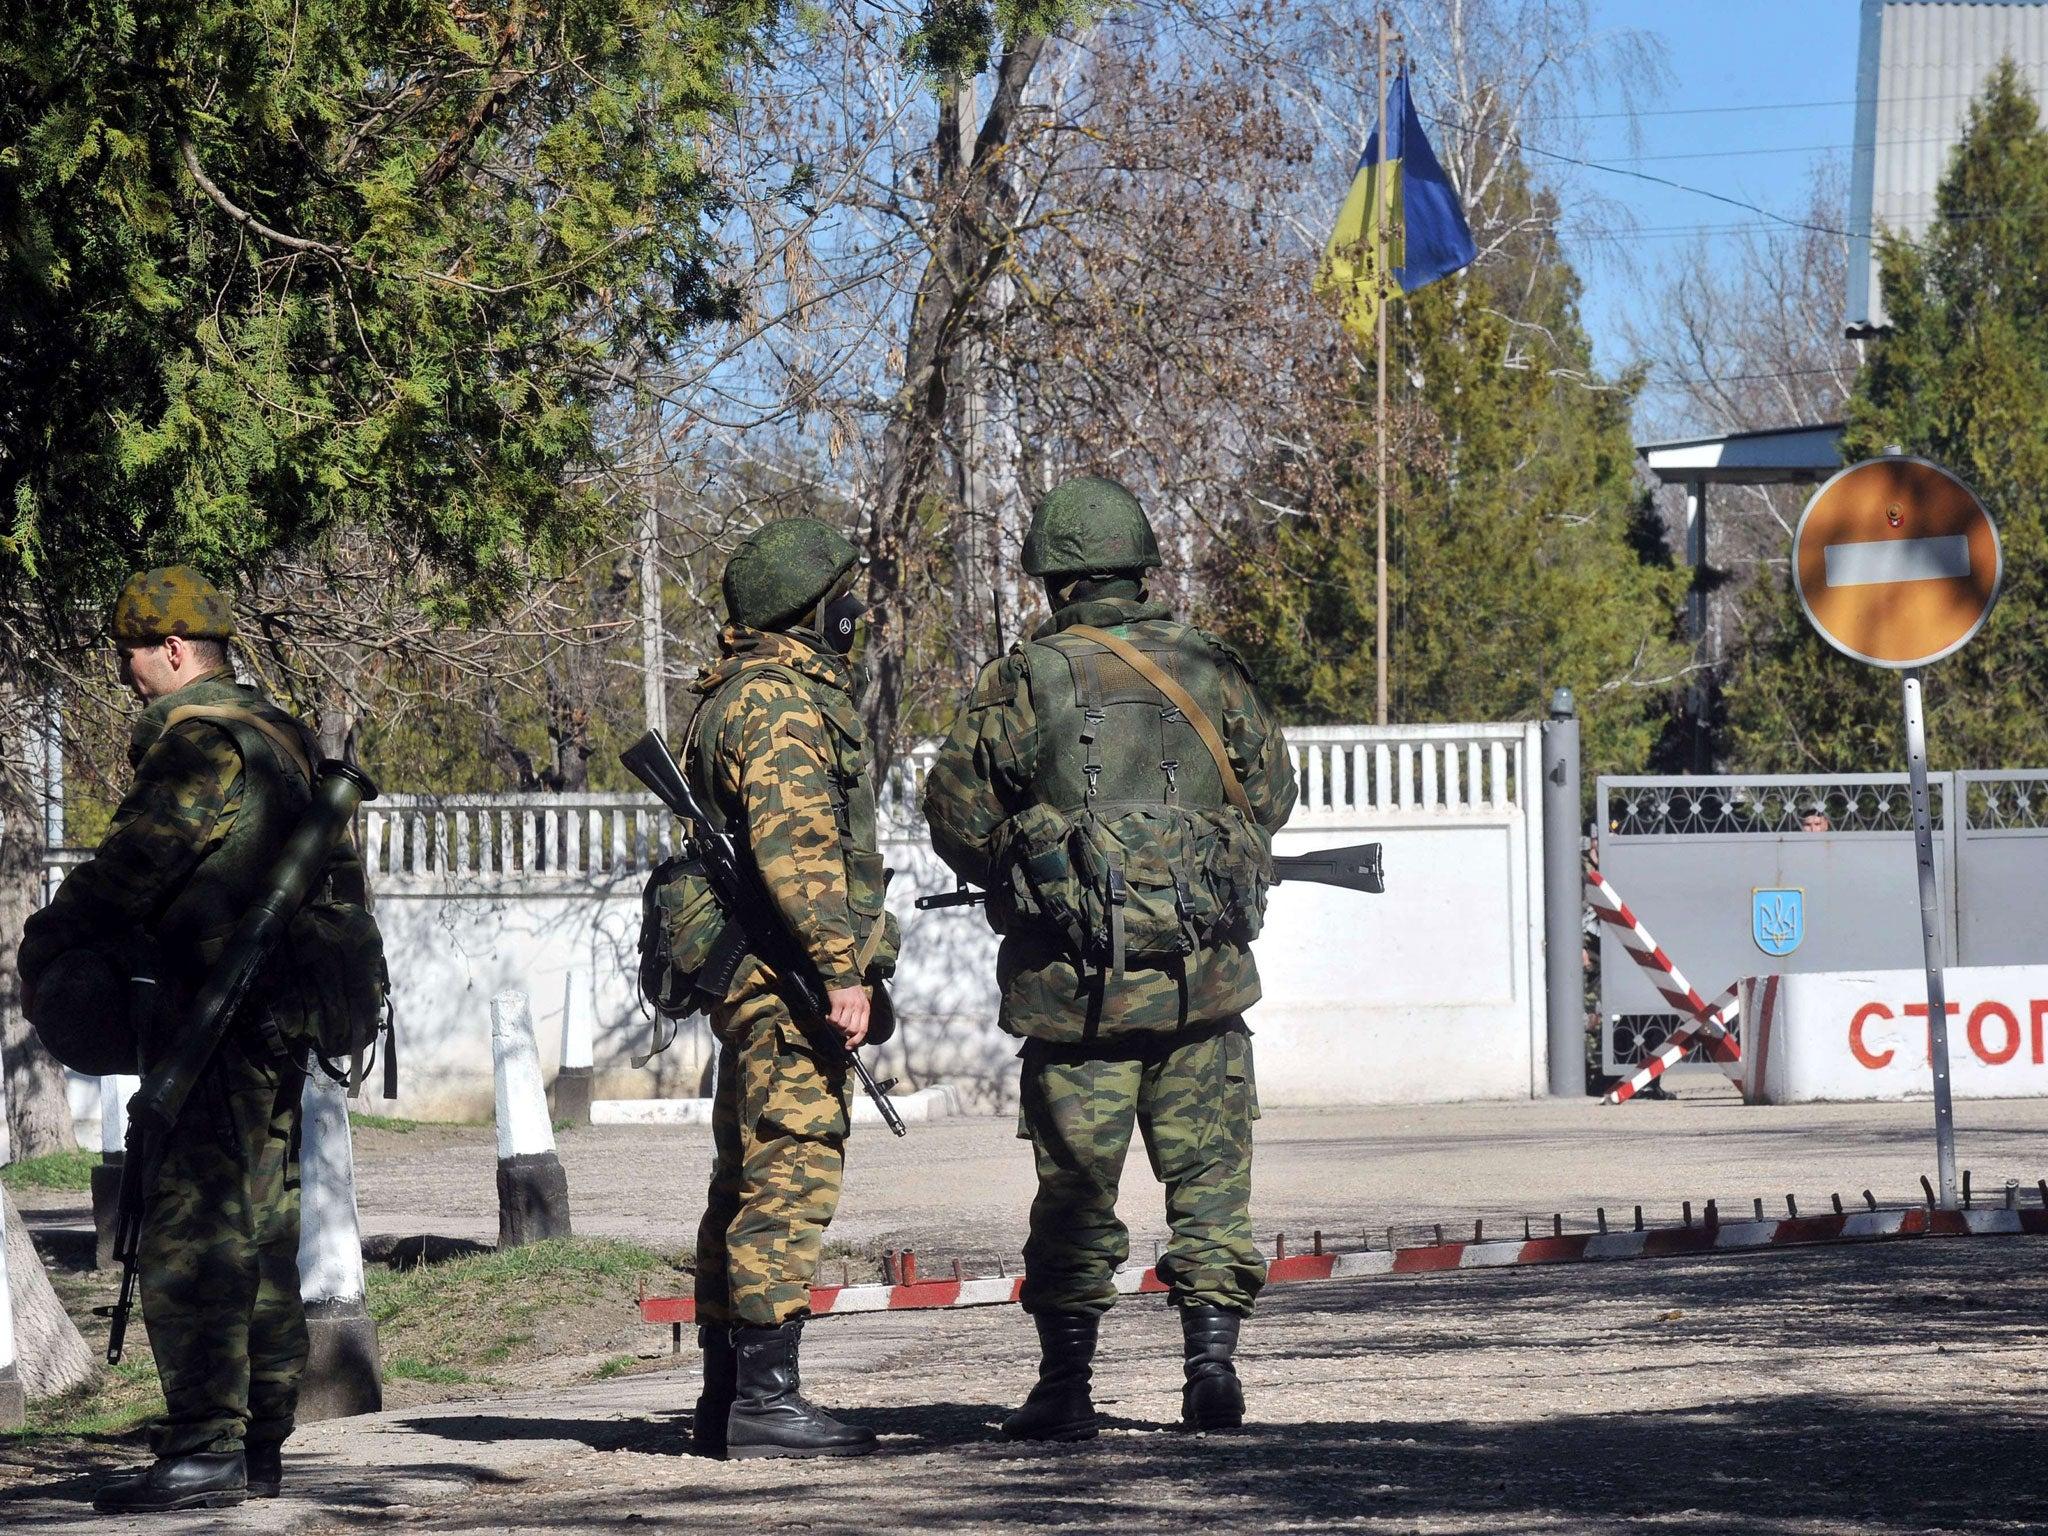 Ukraine crisis: How do you solve a problem like Crimea? | The